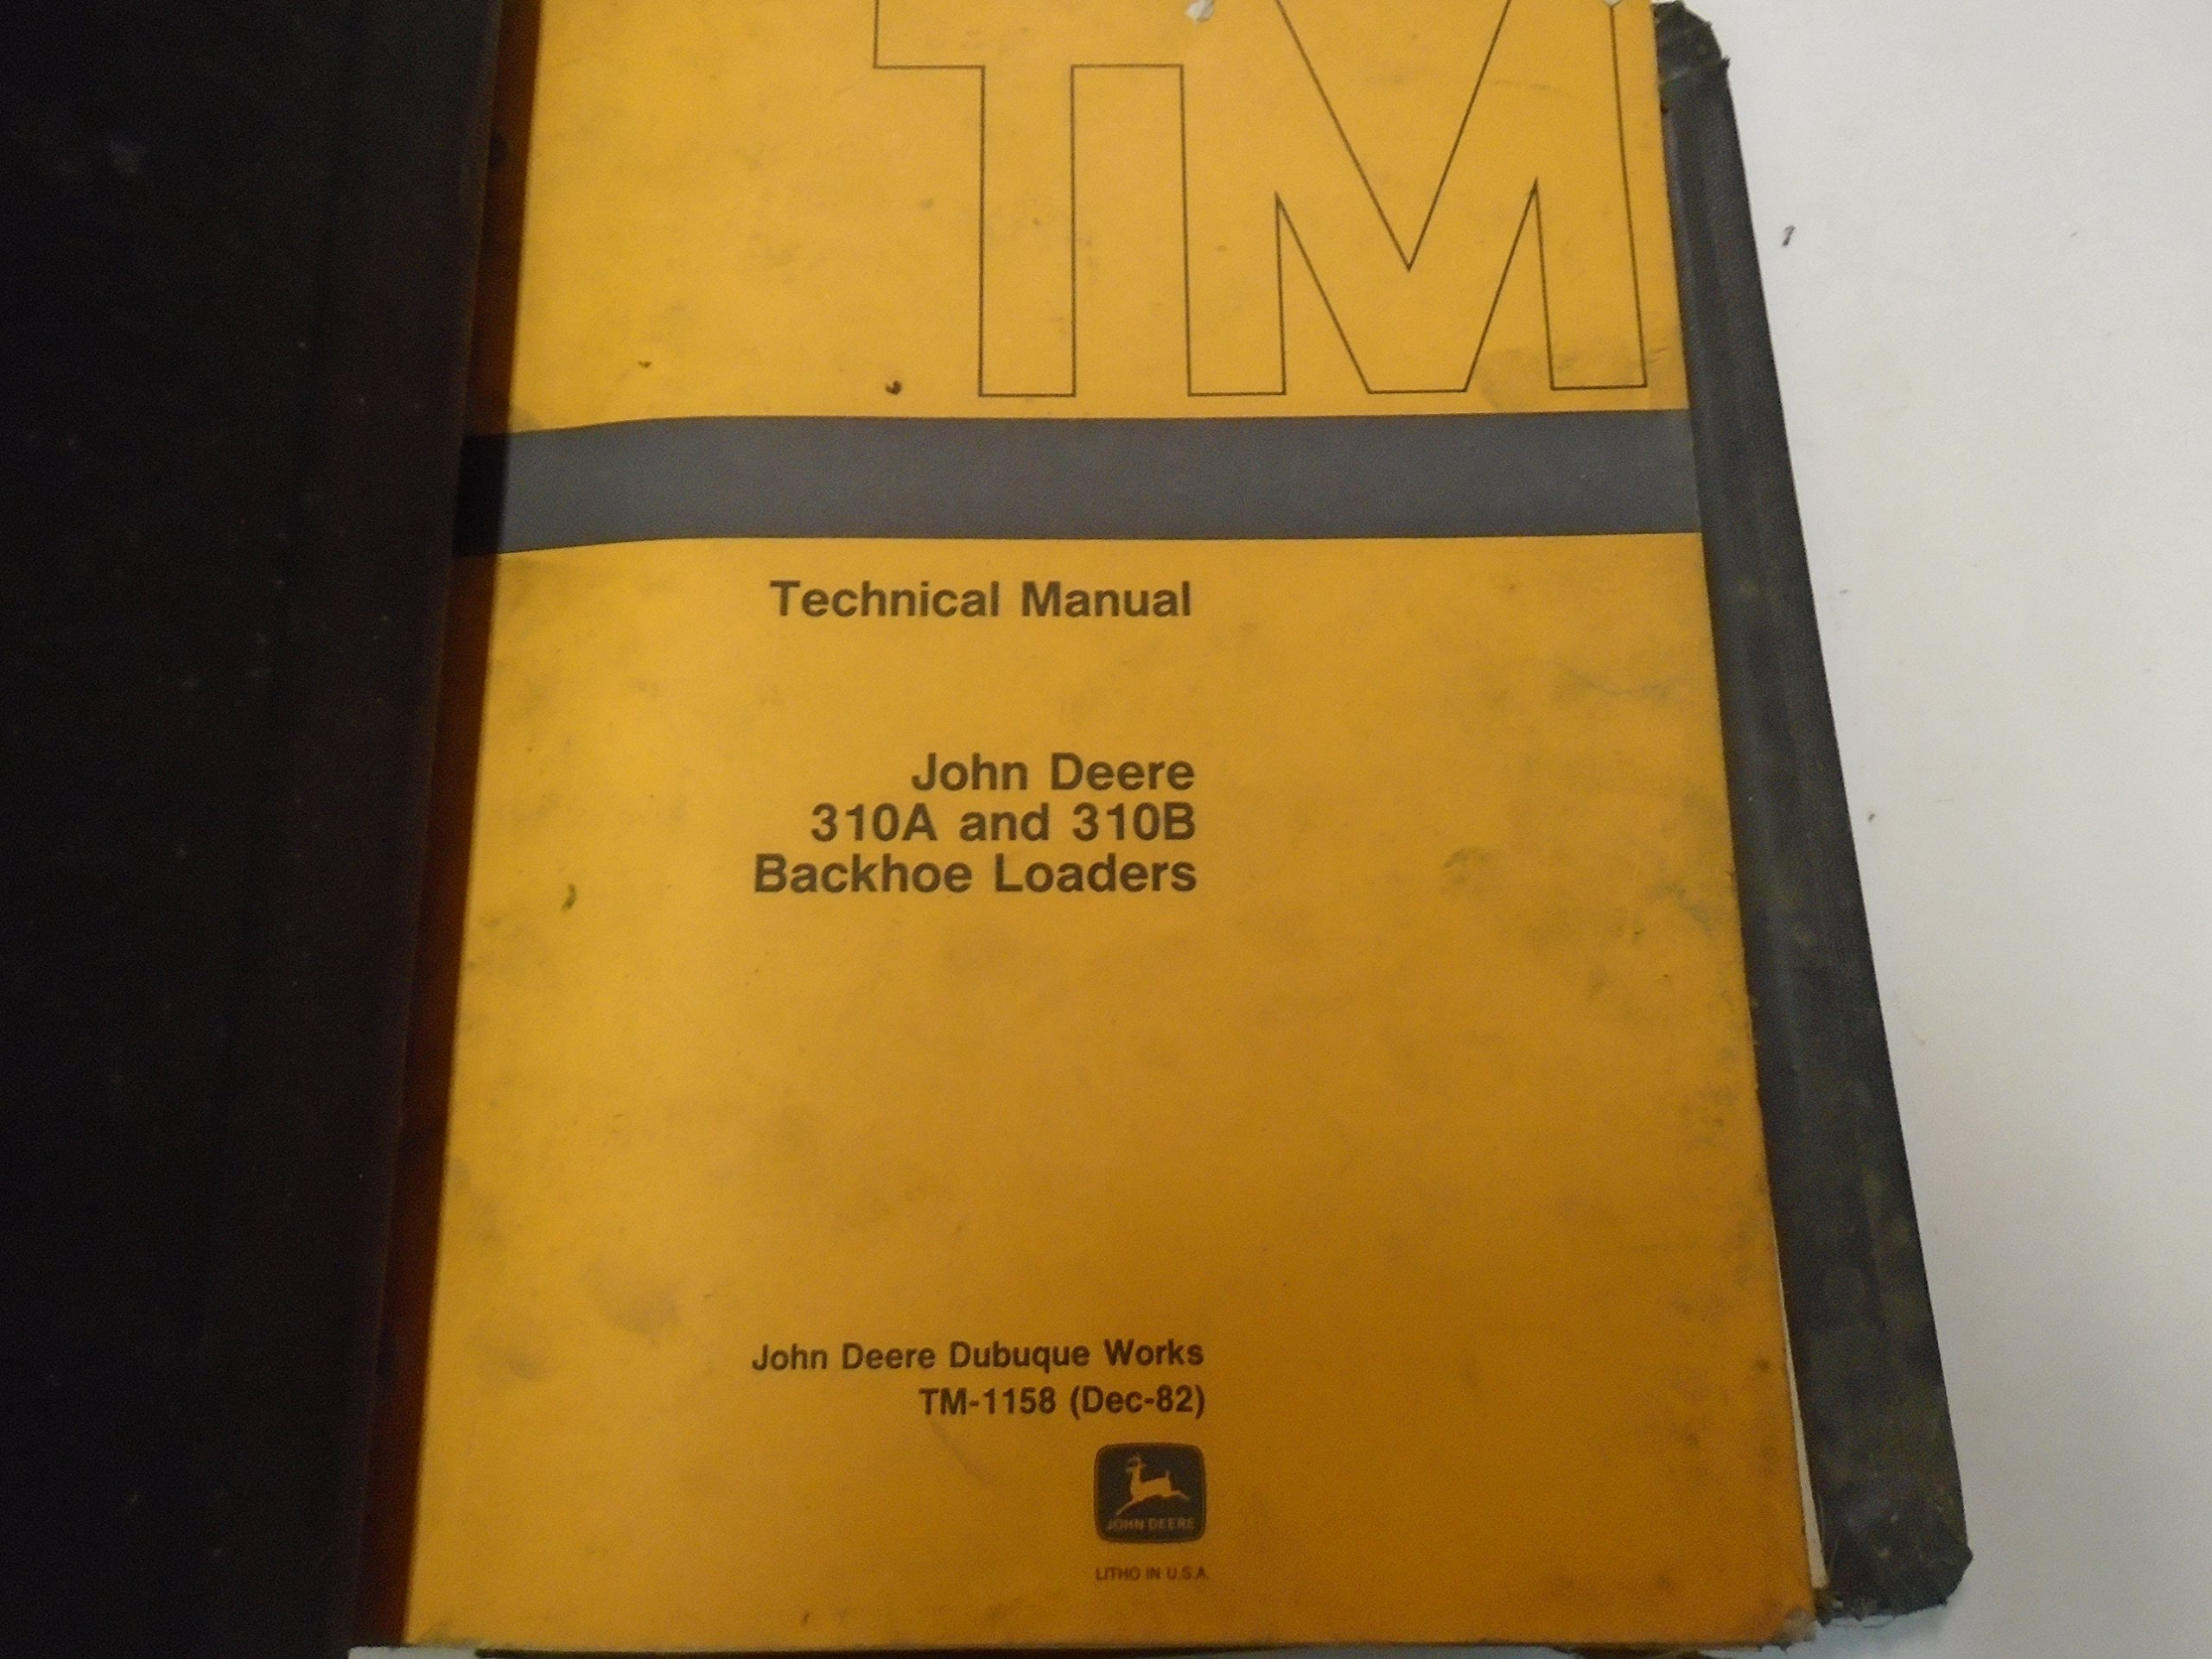 John Deere 310A 310B Backhoe Loader Service Manual OEM FACTORY With Binder  ***: JD INC: Amazon.com: Books